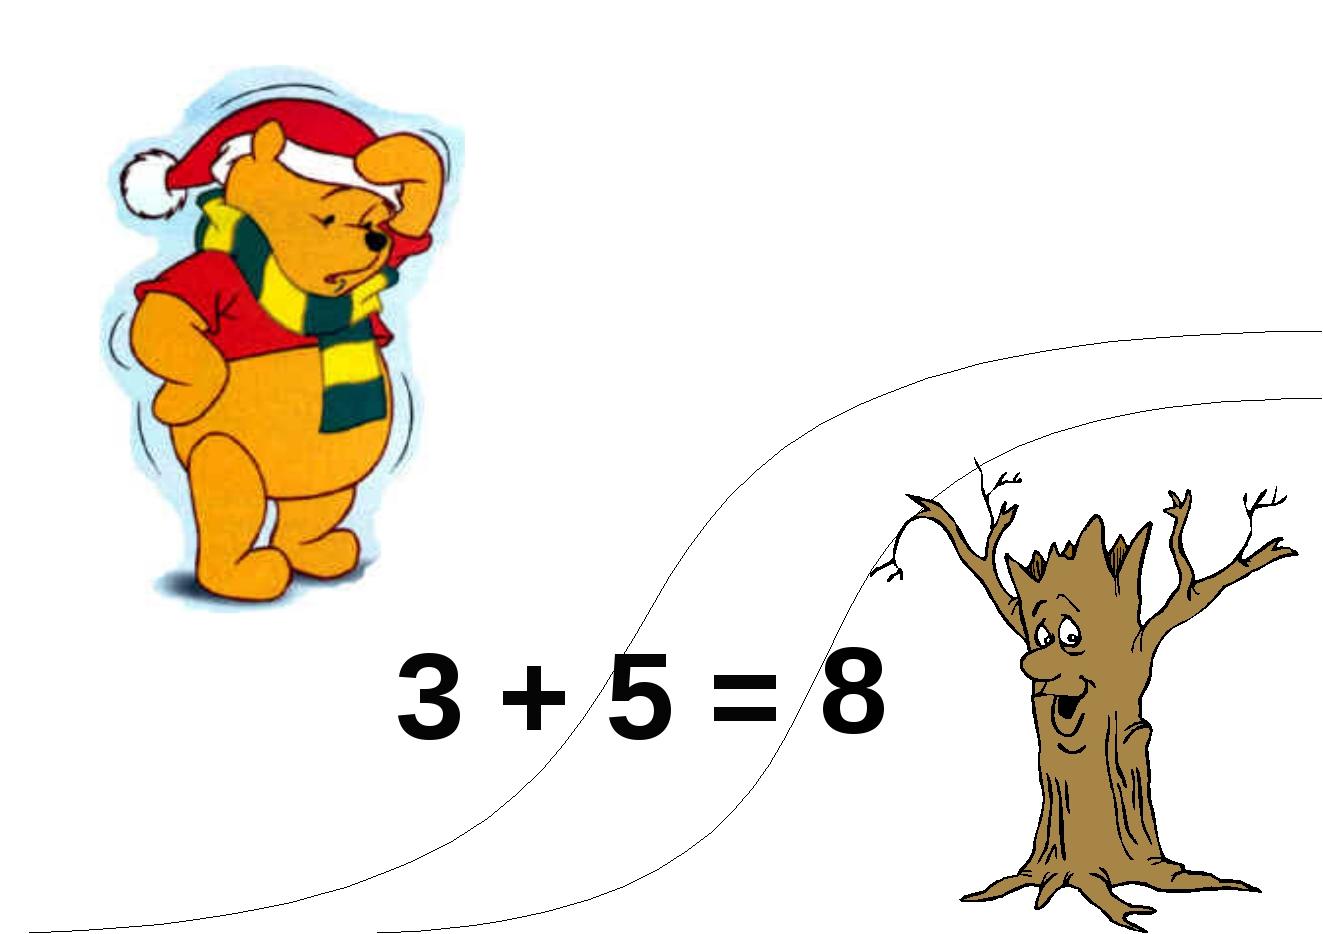 3 + 5 = 8